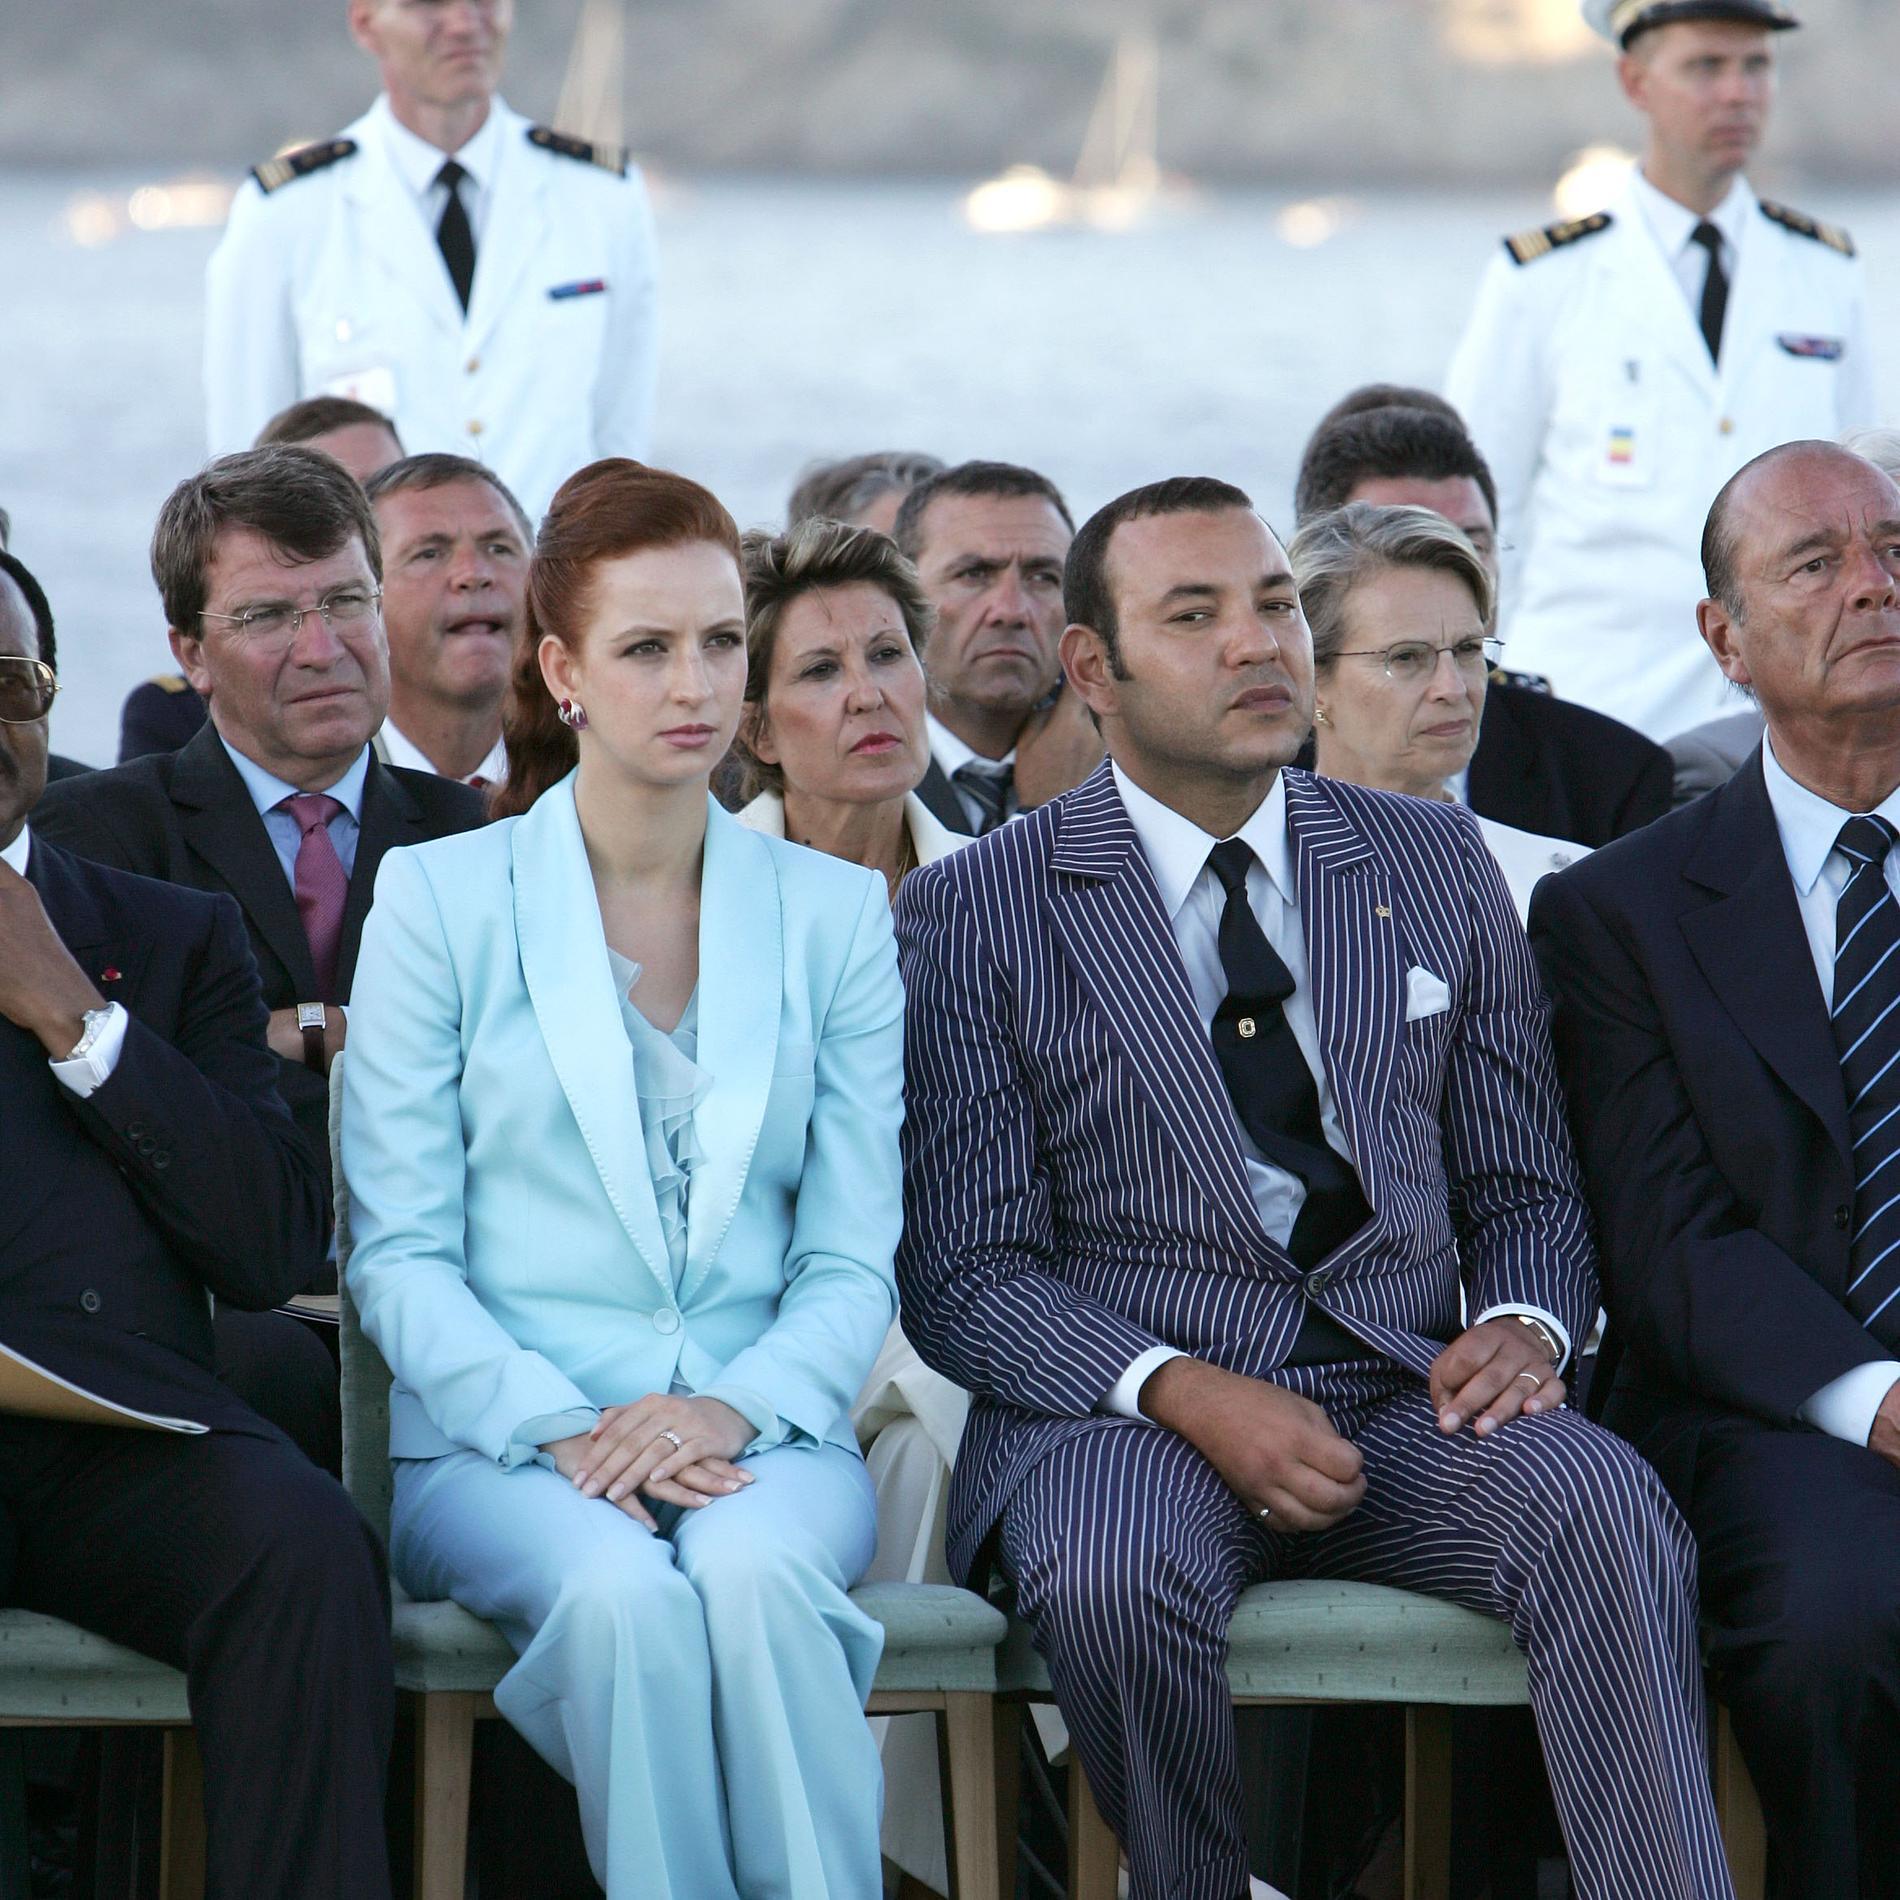 La princesse Lalla Salma et le roi du Maroc